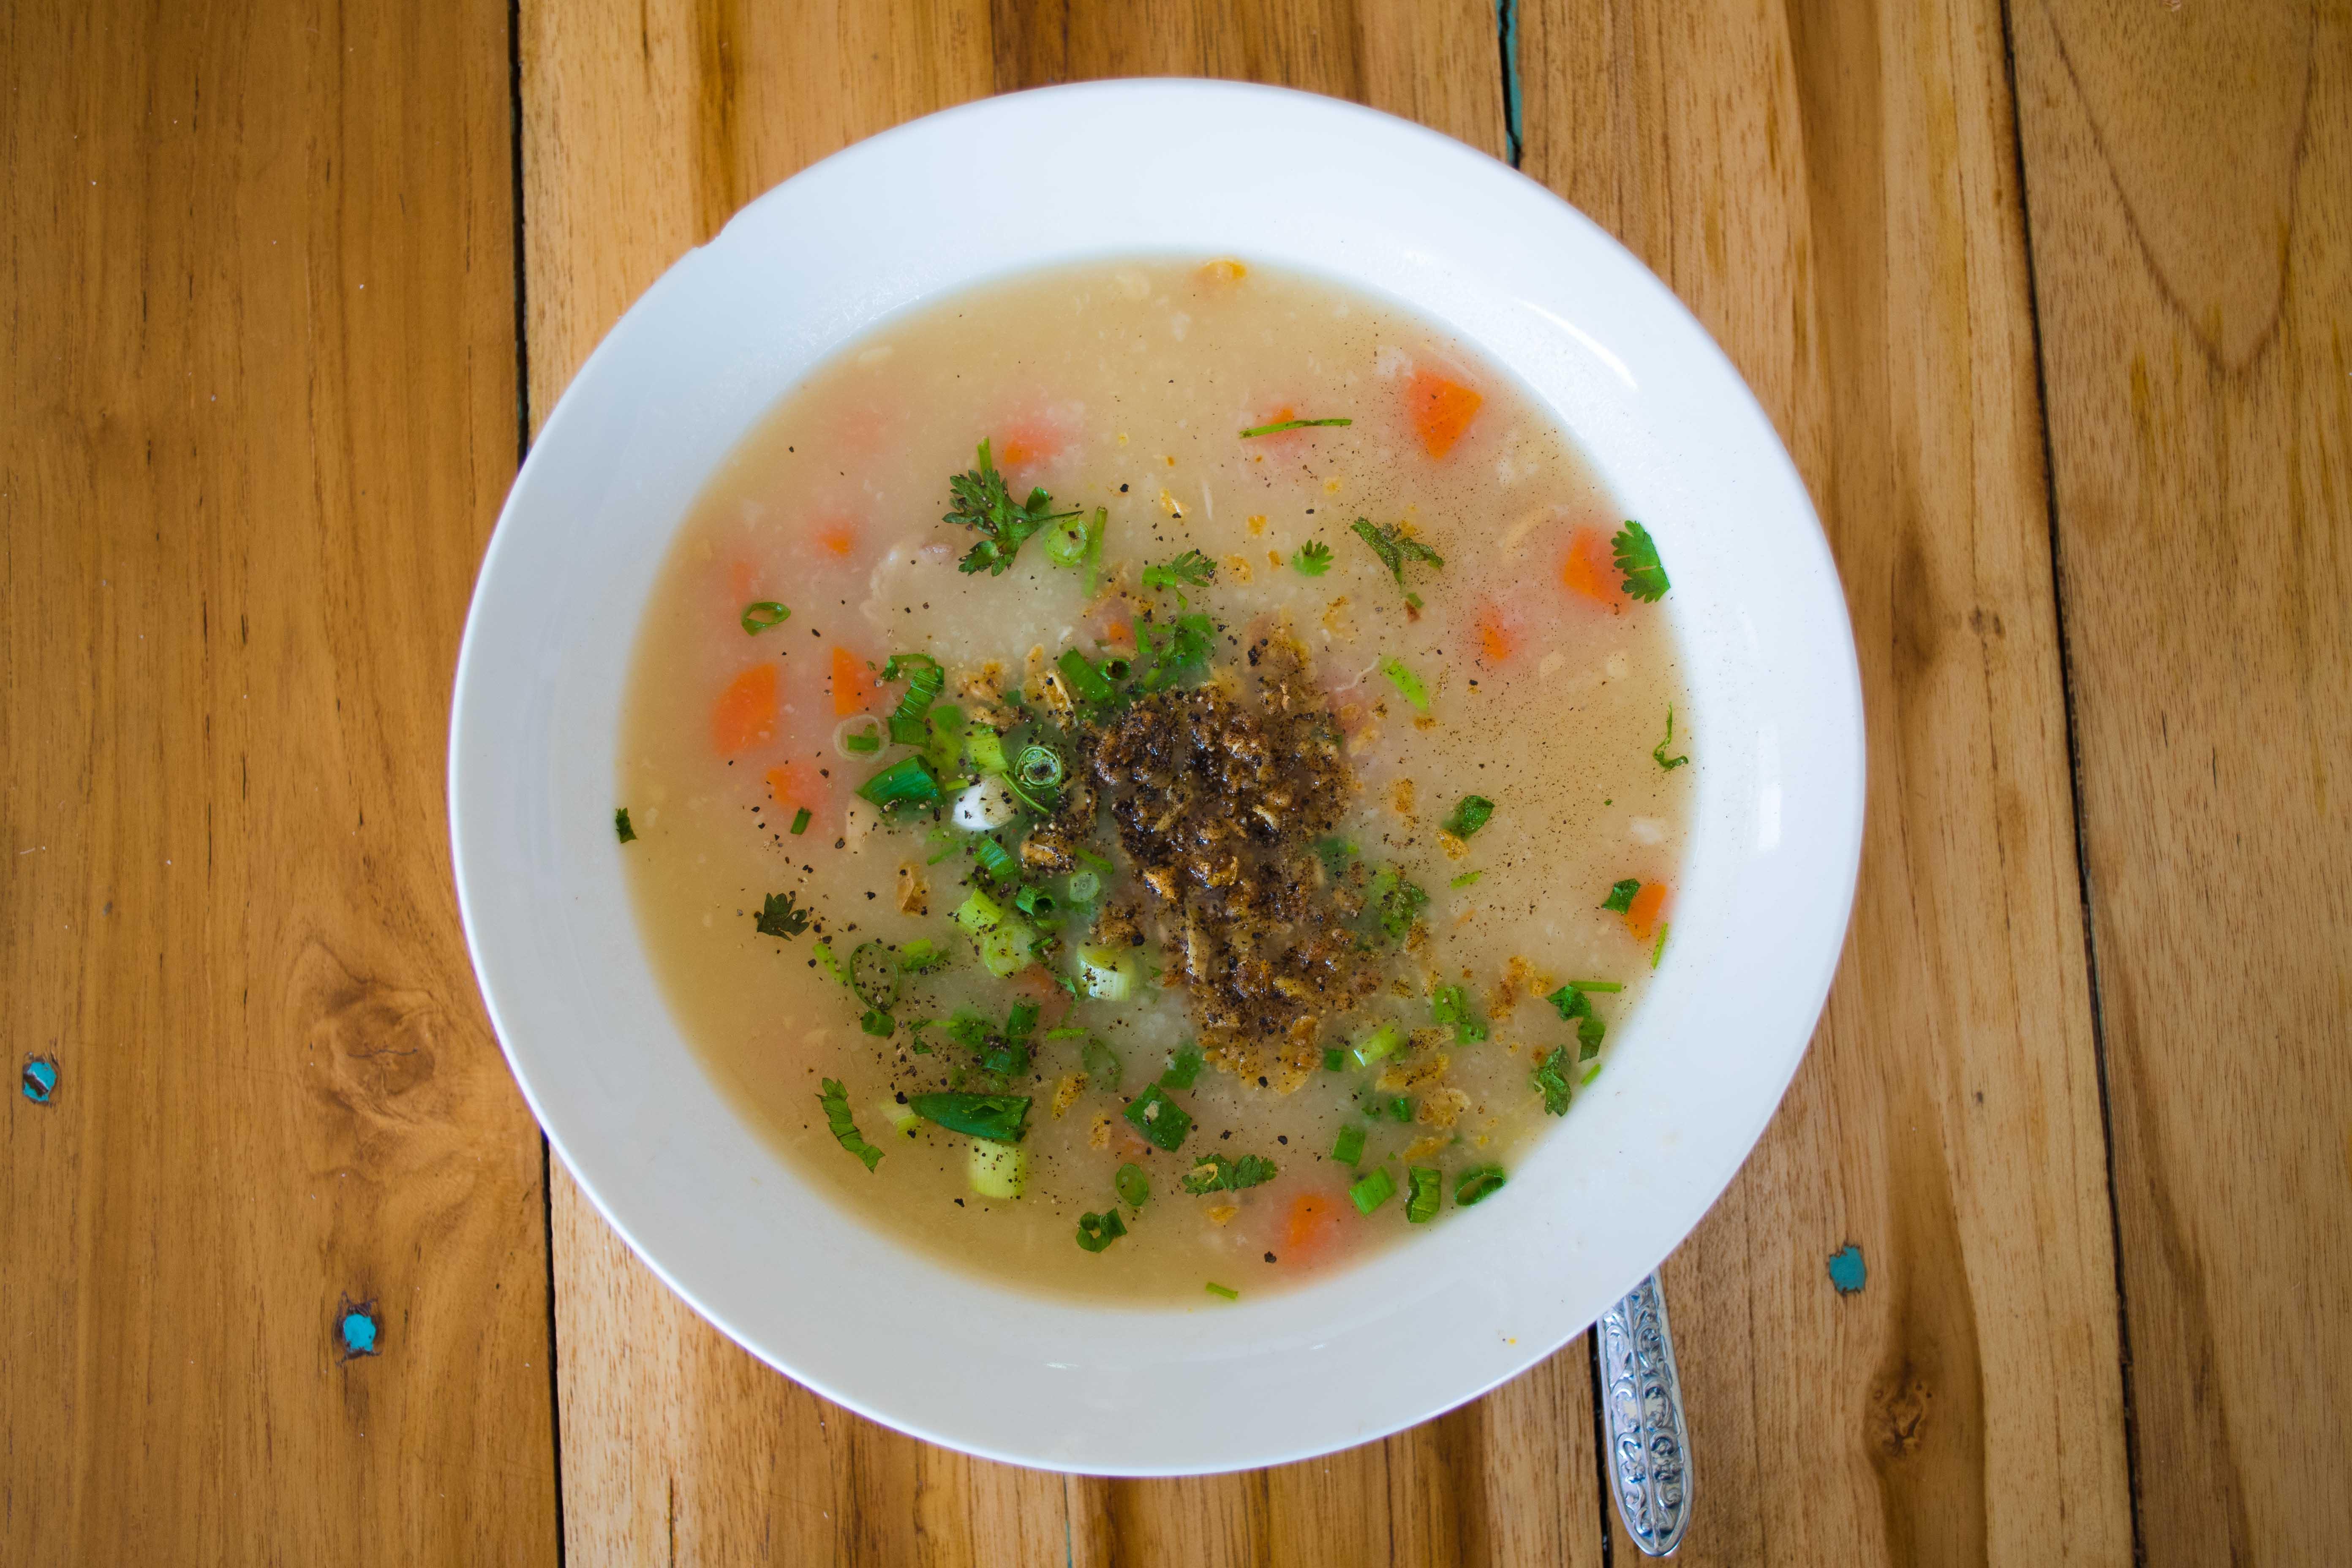 Pinkeo's Laotiaanse rijstsoep